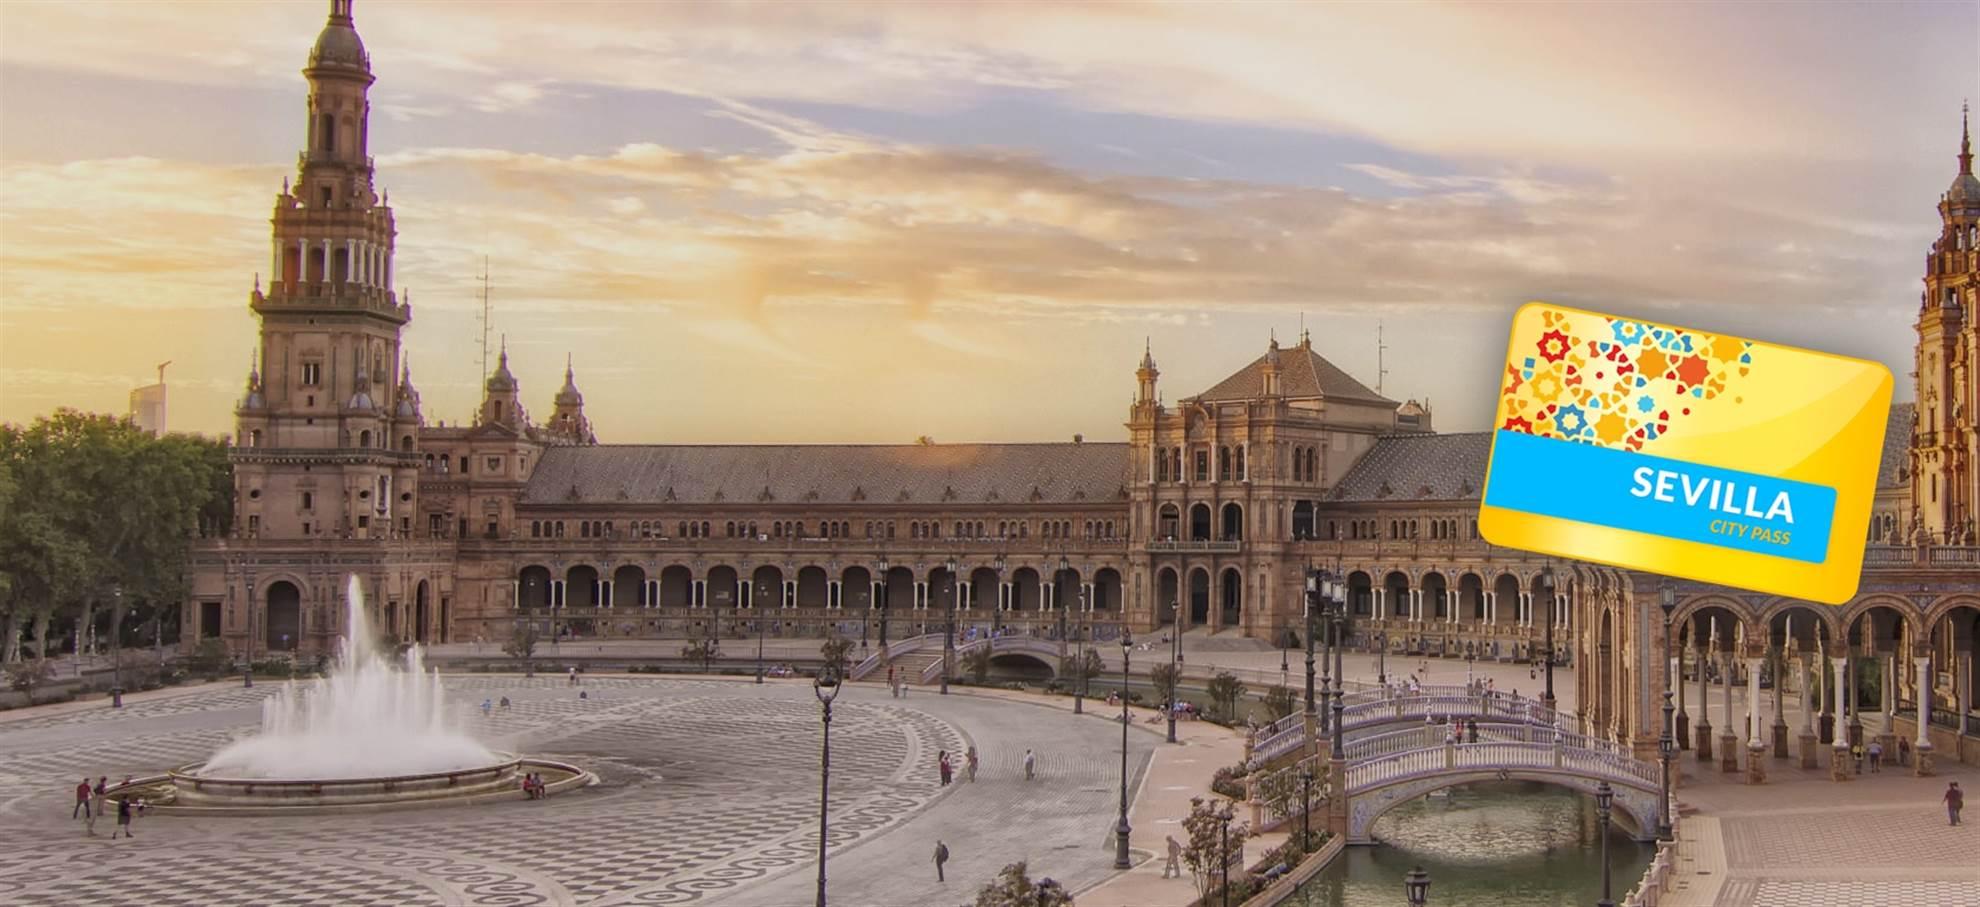 Sevilla City Pass (Alcazar, Kathedrale von Sevilla)